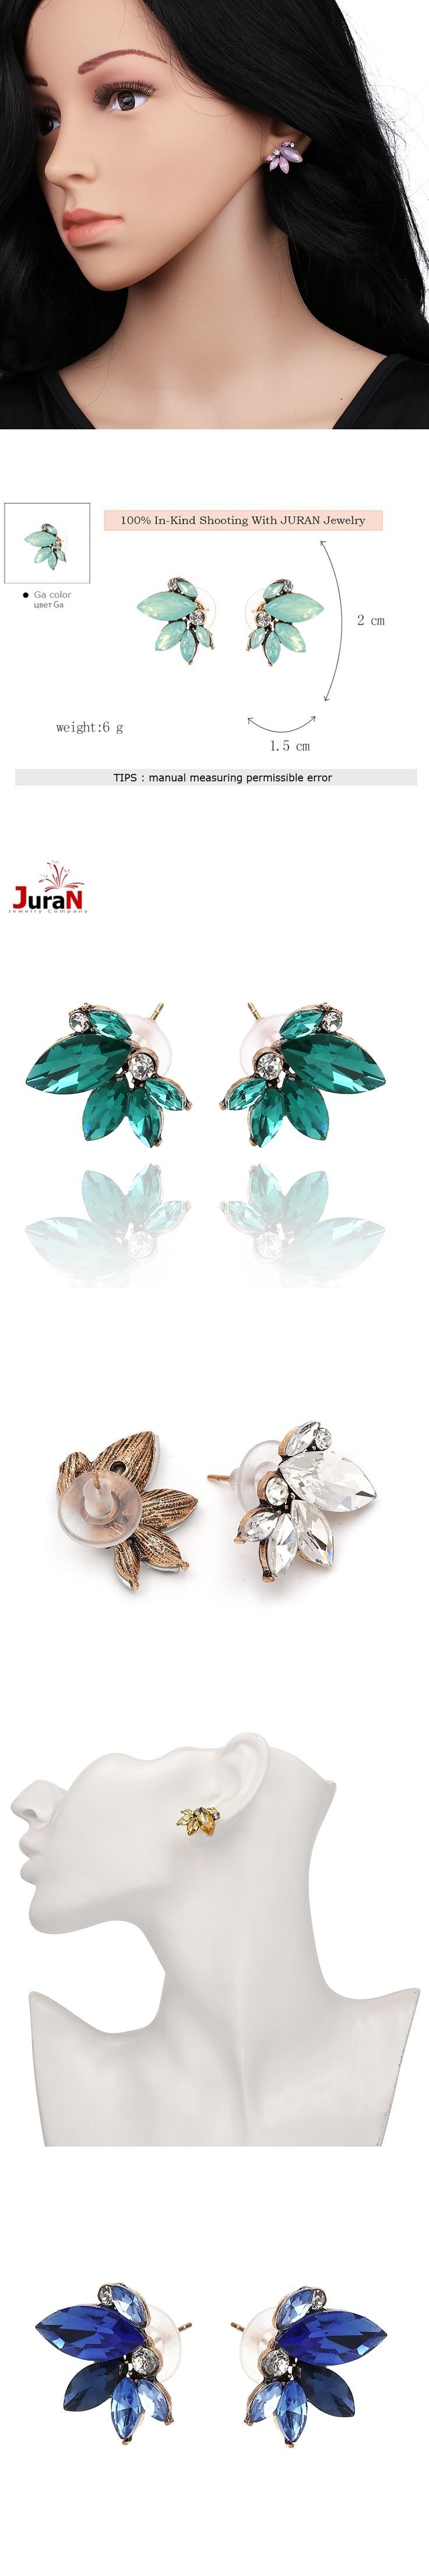 JURAN Cute Romantic Crystal Earring Statement 2017 Pink Gem Beads Sweet Stud Earrings For Women Party Wedding Wholesale F2409